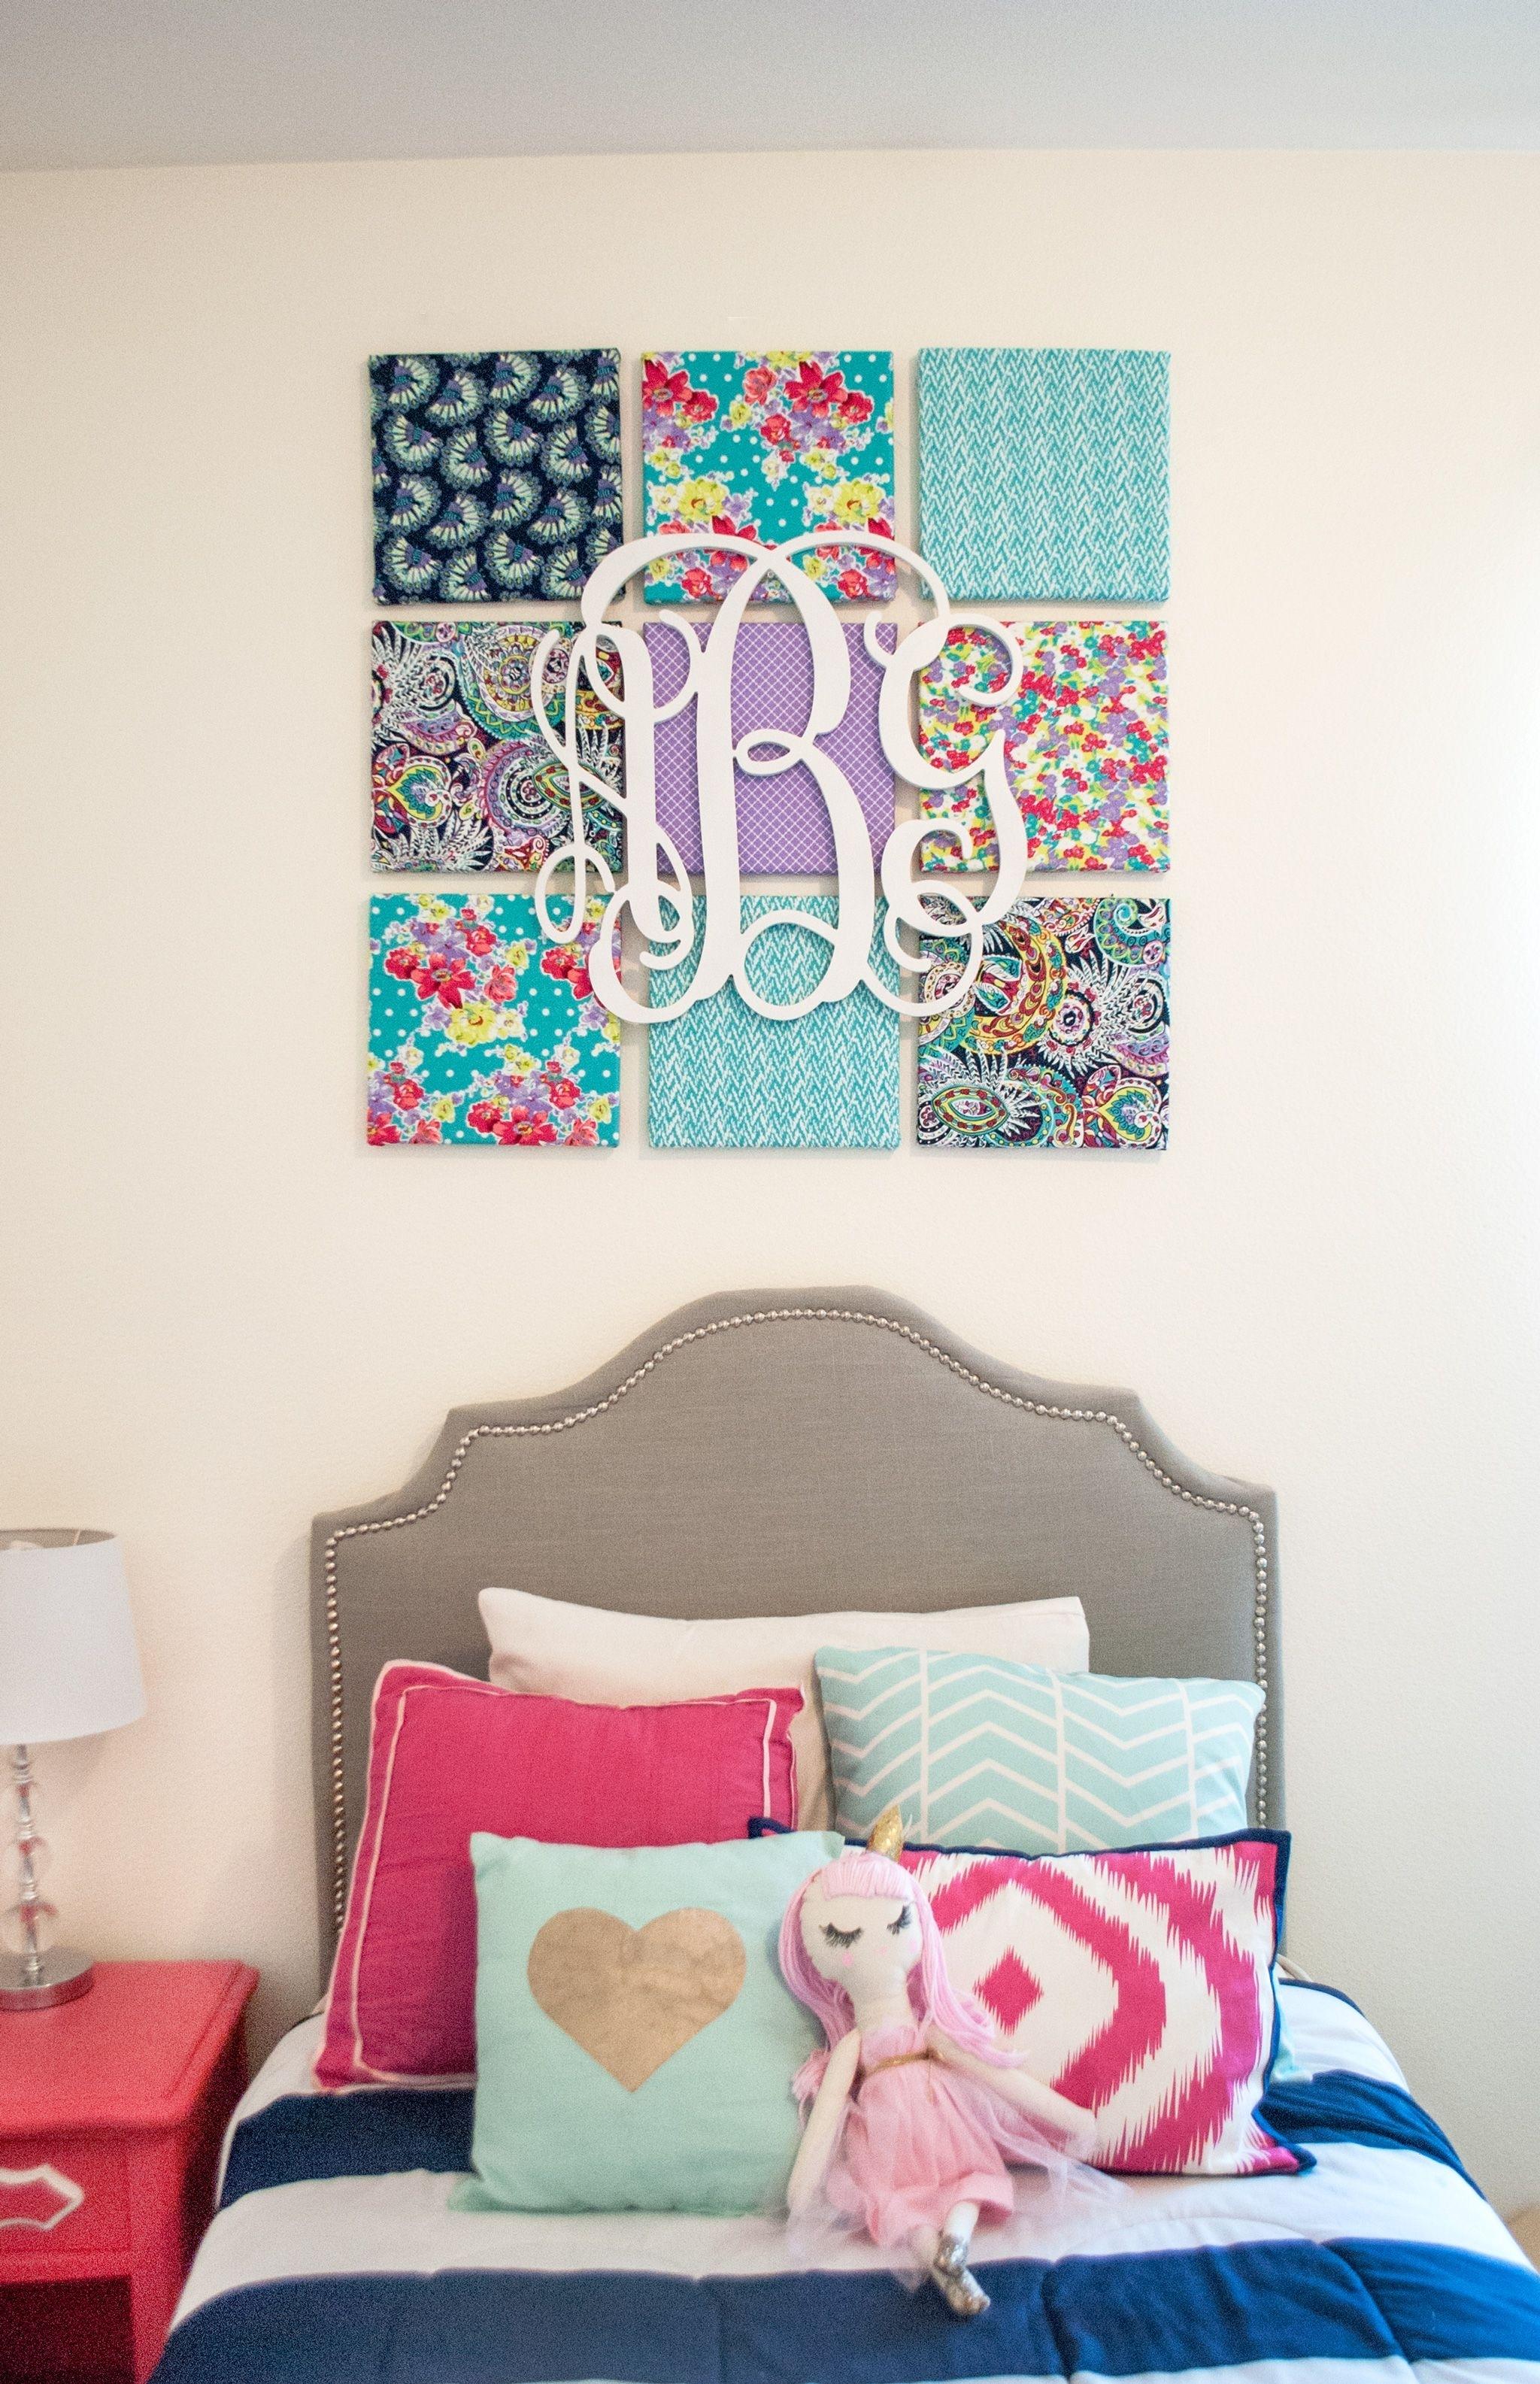 Diy Fabric Wall Art | Monogram Wall, Kids Rooms And Monograms In Recent High End Fabric Wall Art (View 4 of 15)